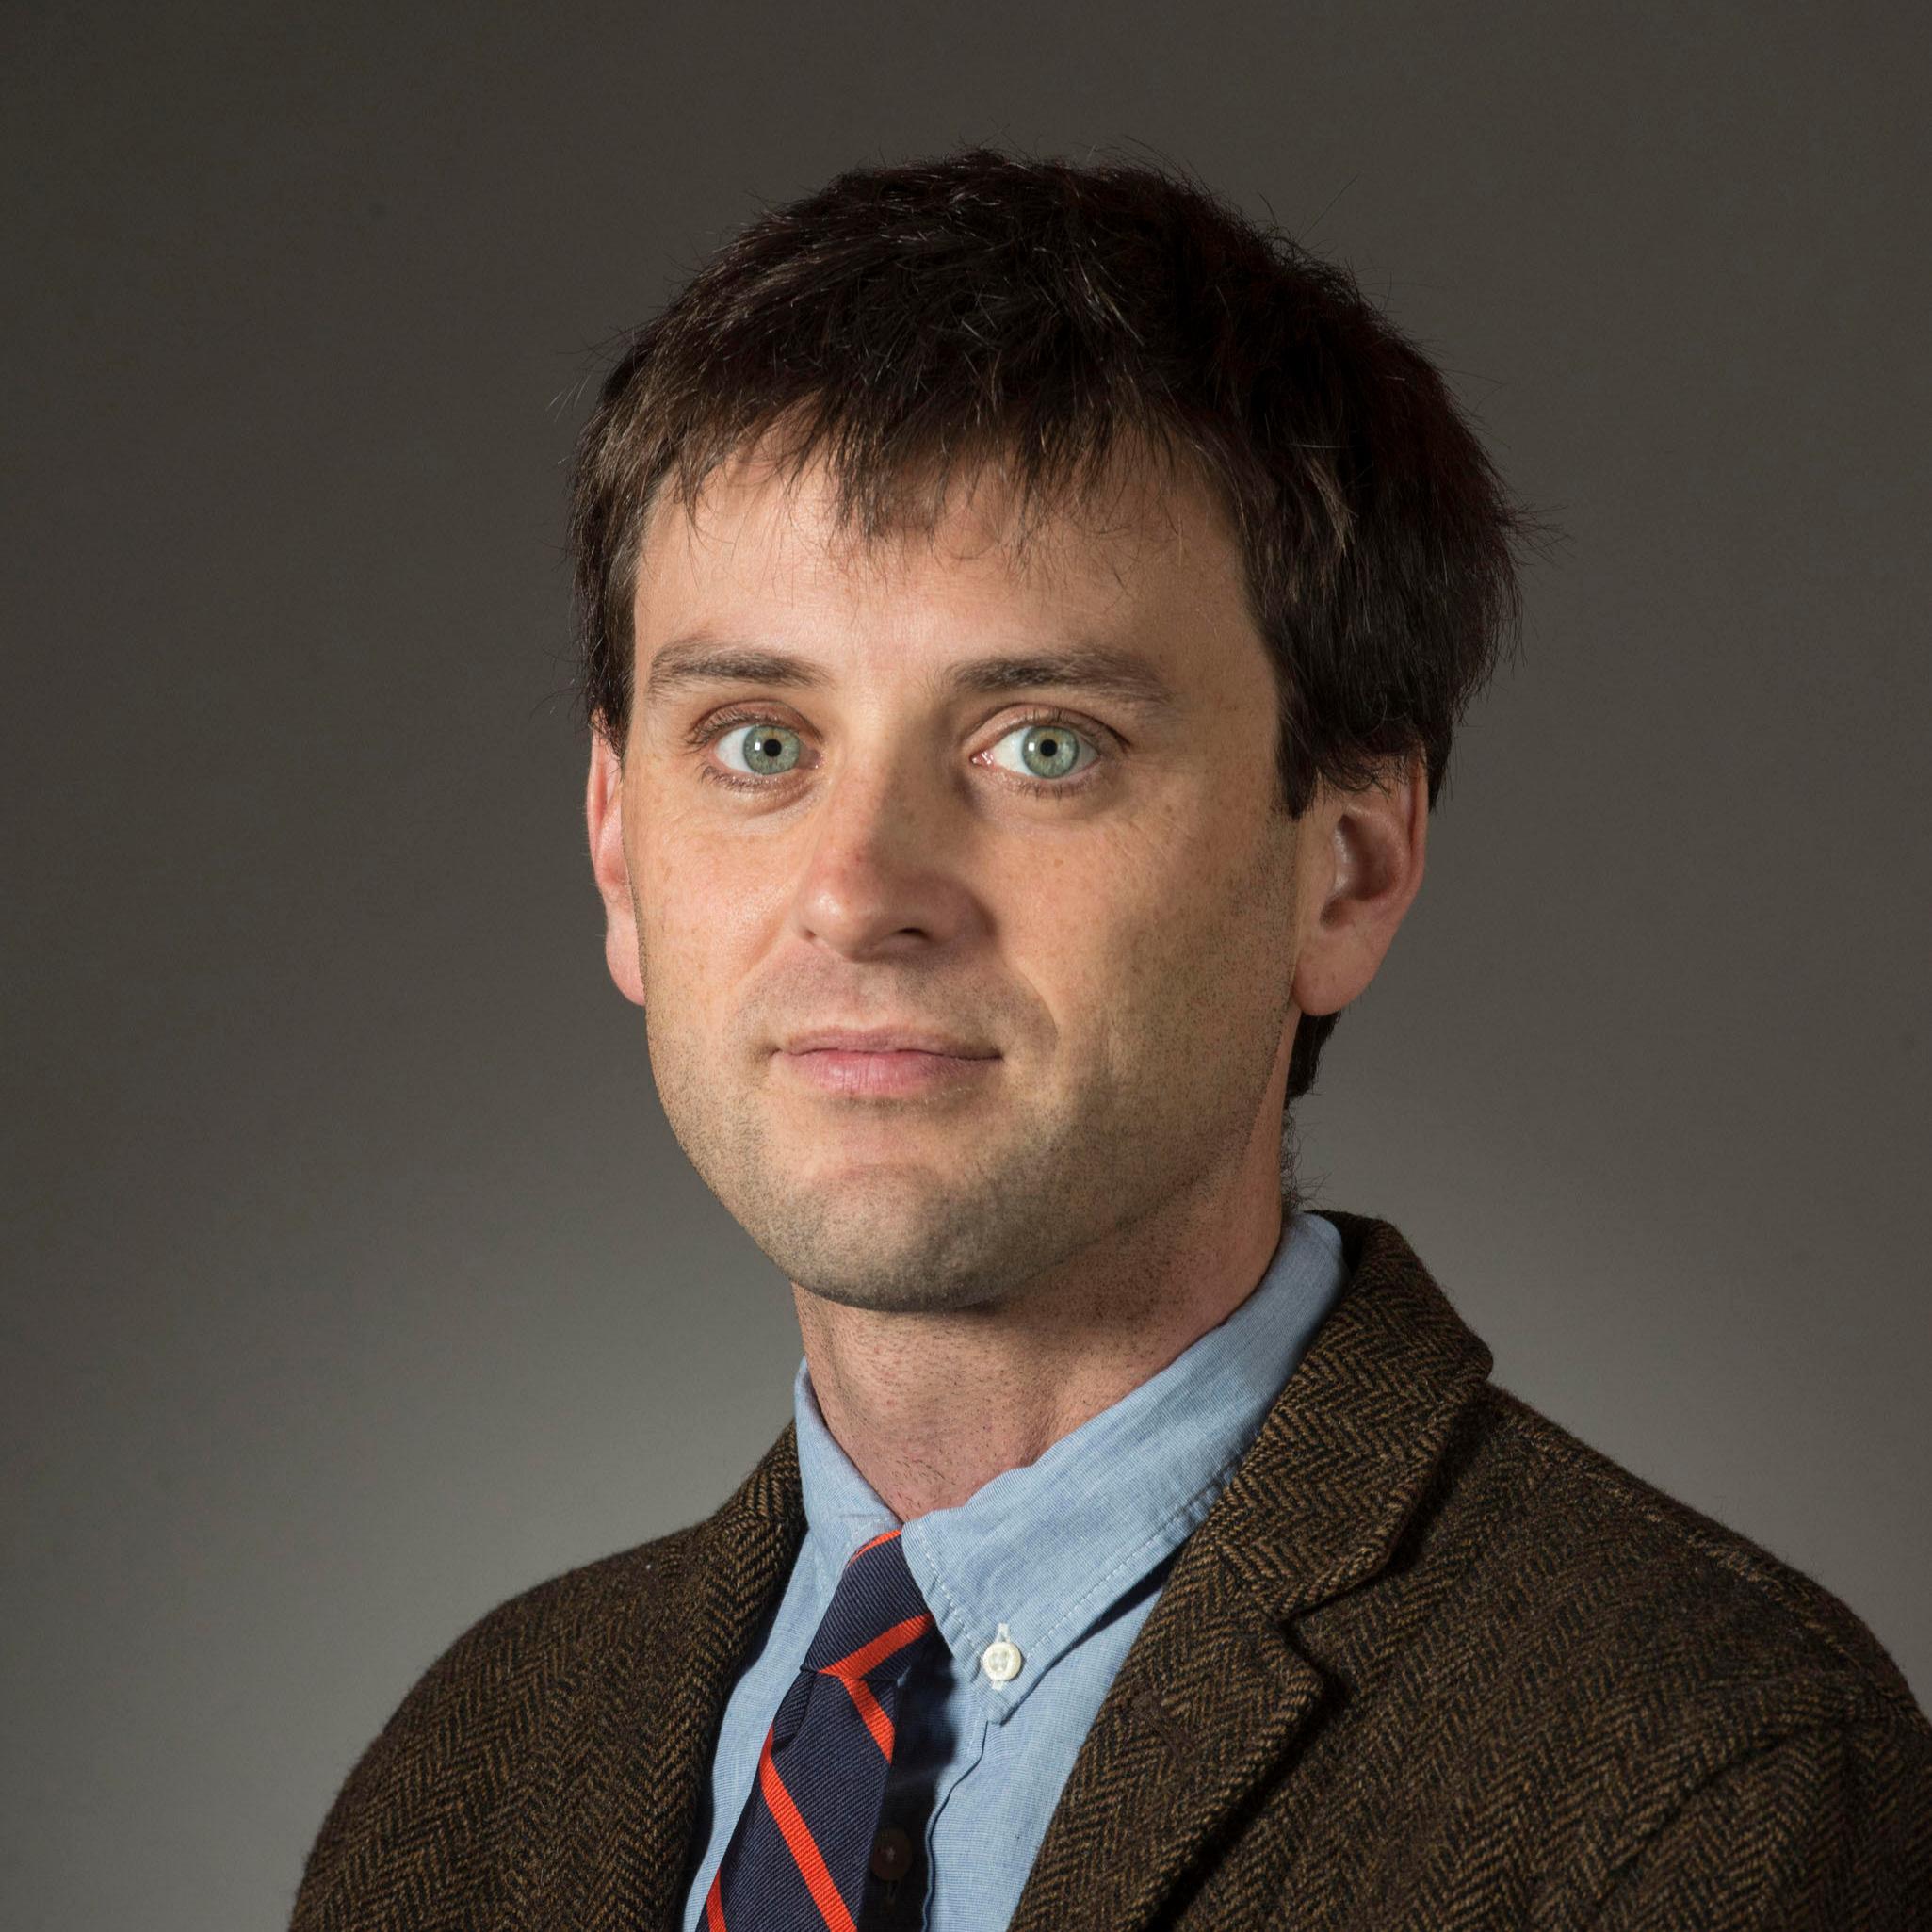 Chris Willard, PsyD